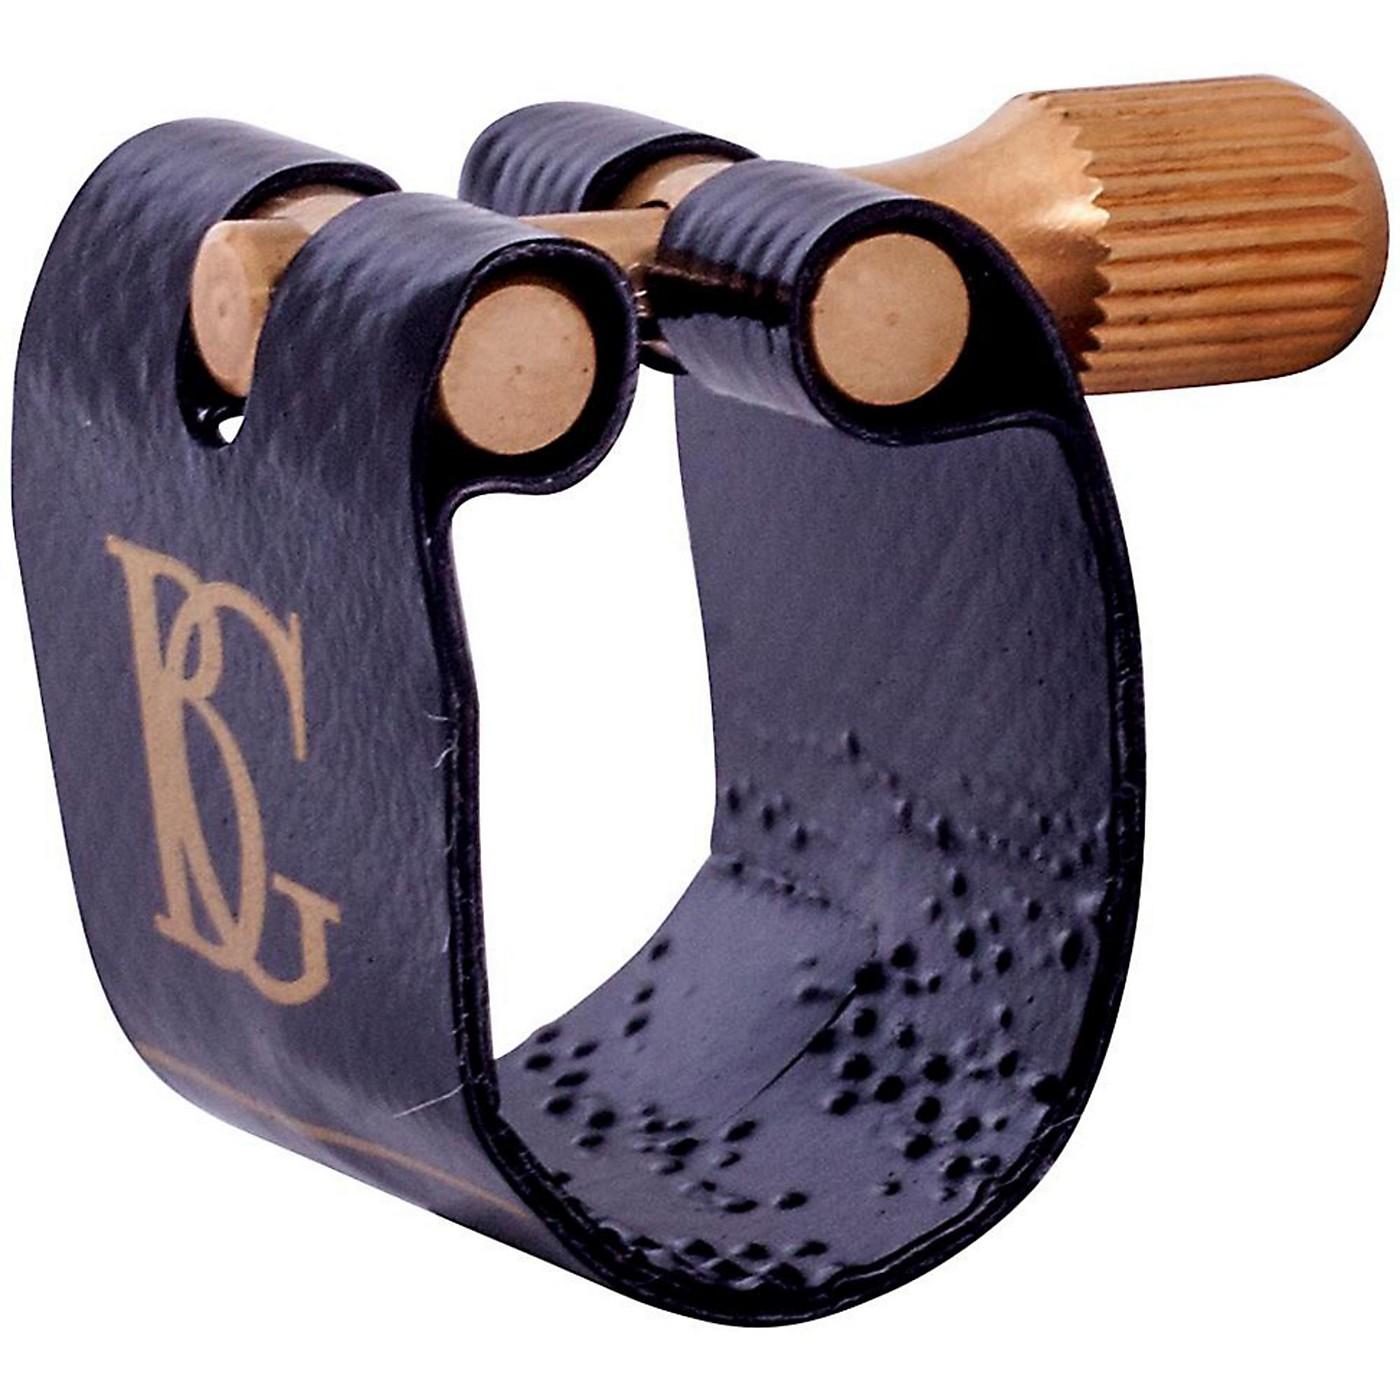 BG Flex Series Tenor Saxophone Ligature For Metal Mouthpieces thumbnail